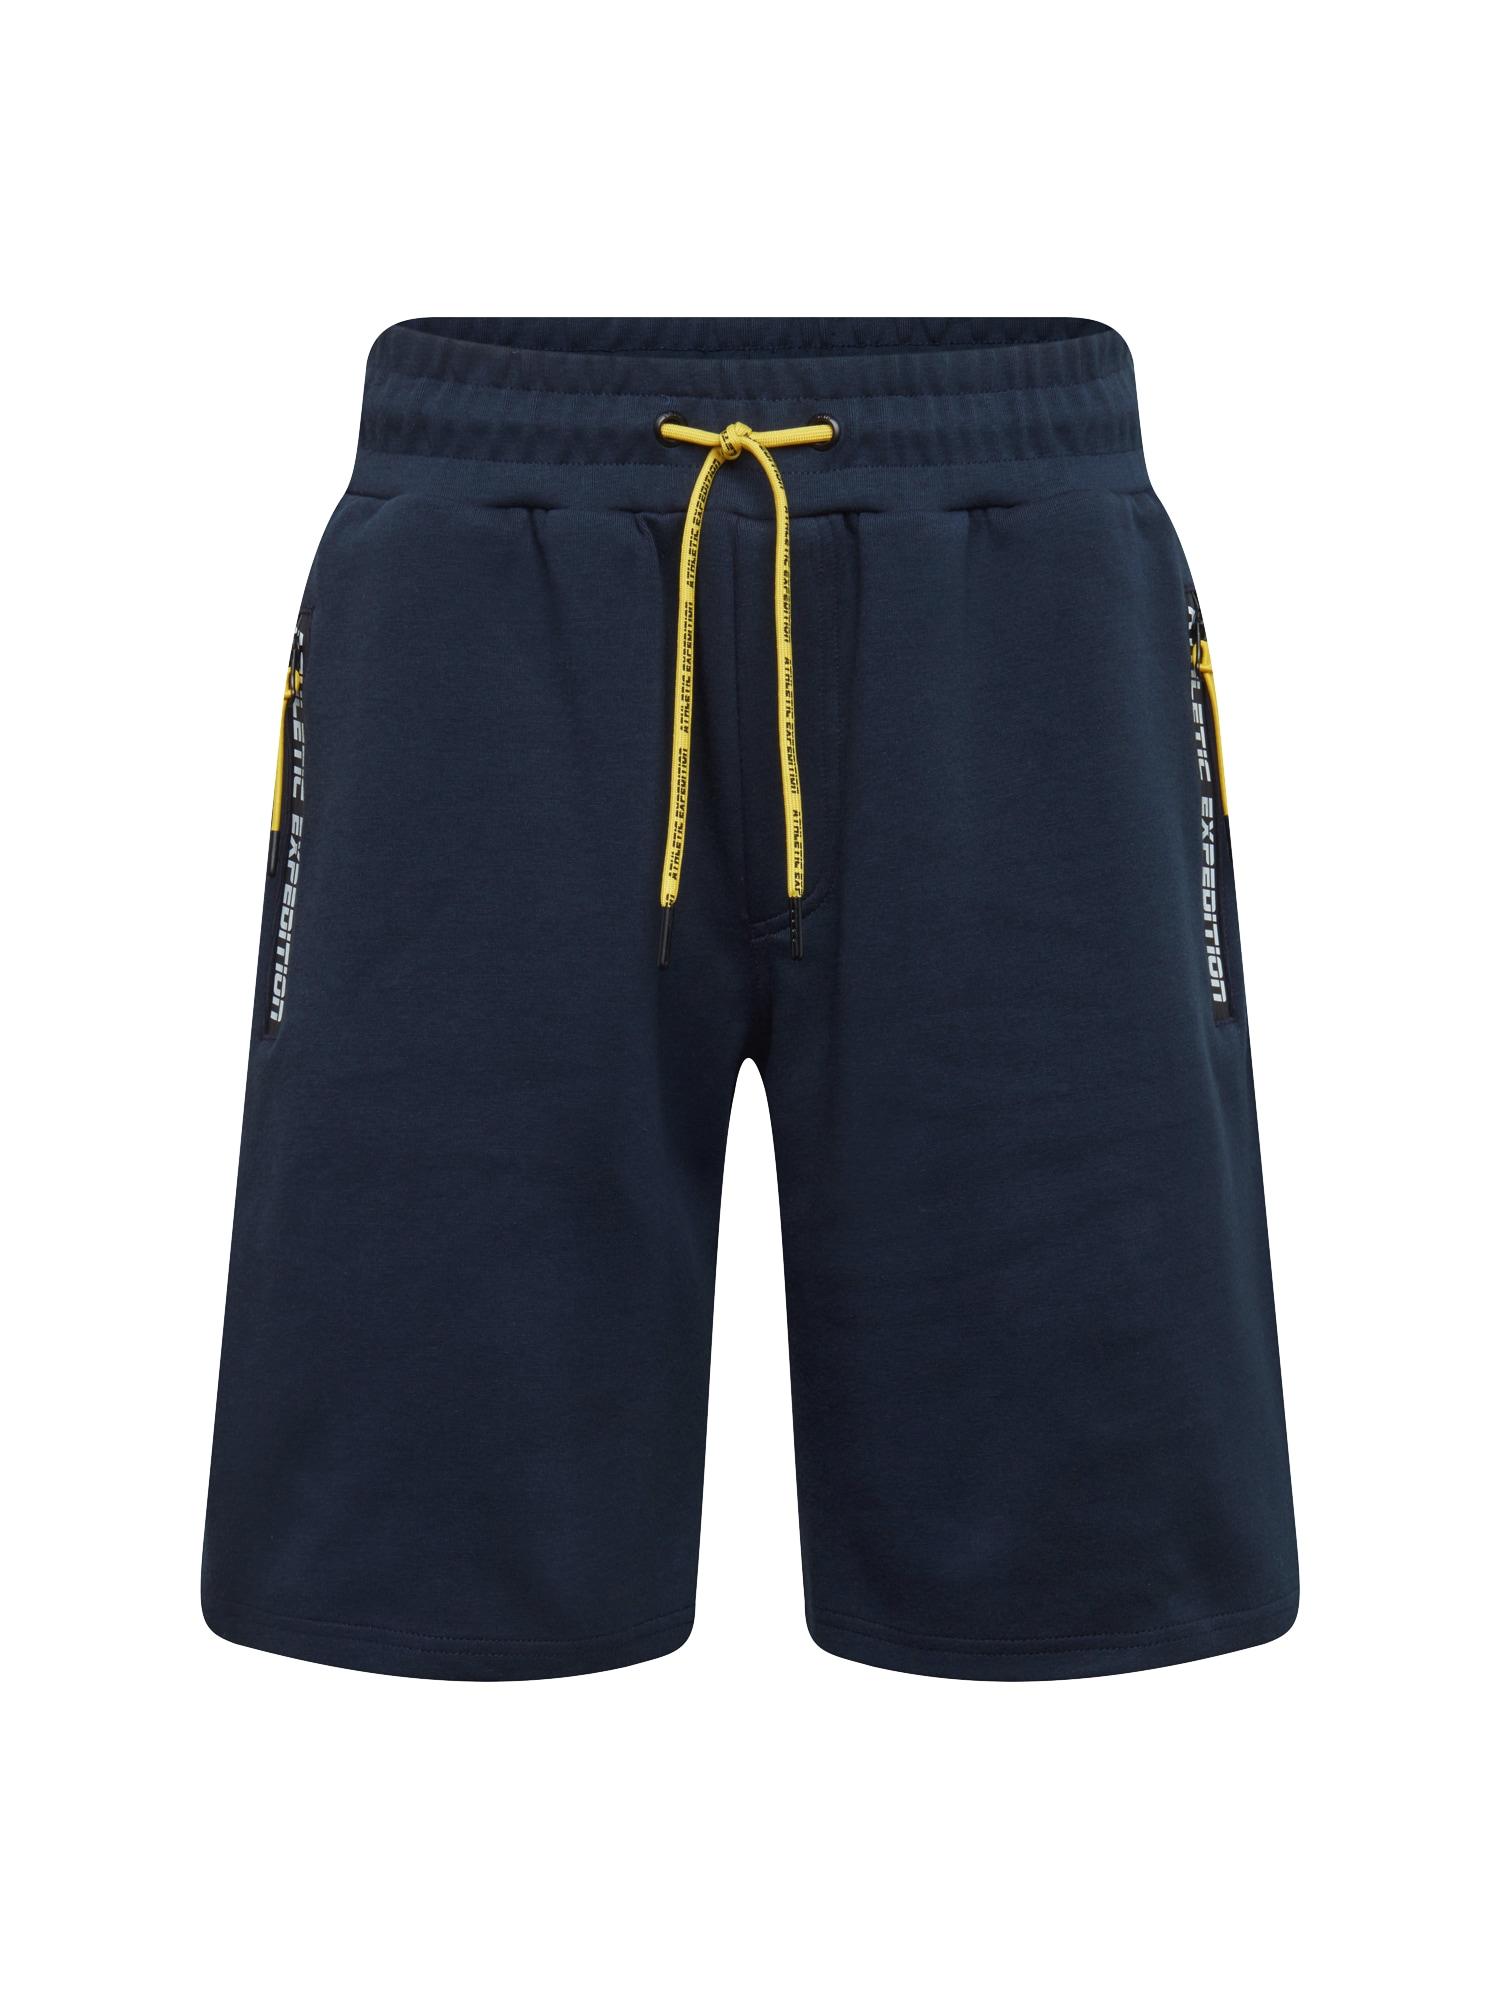 Kalhoty Antifit-Baden tmavě modrá !Solid